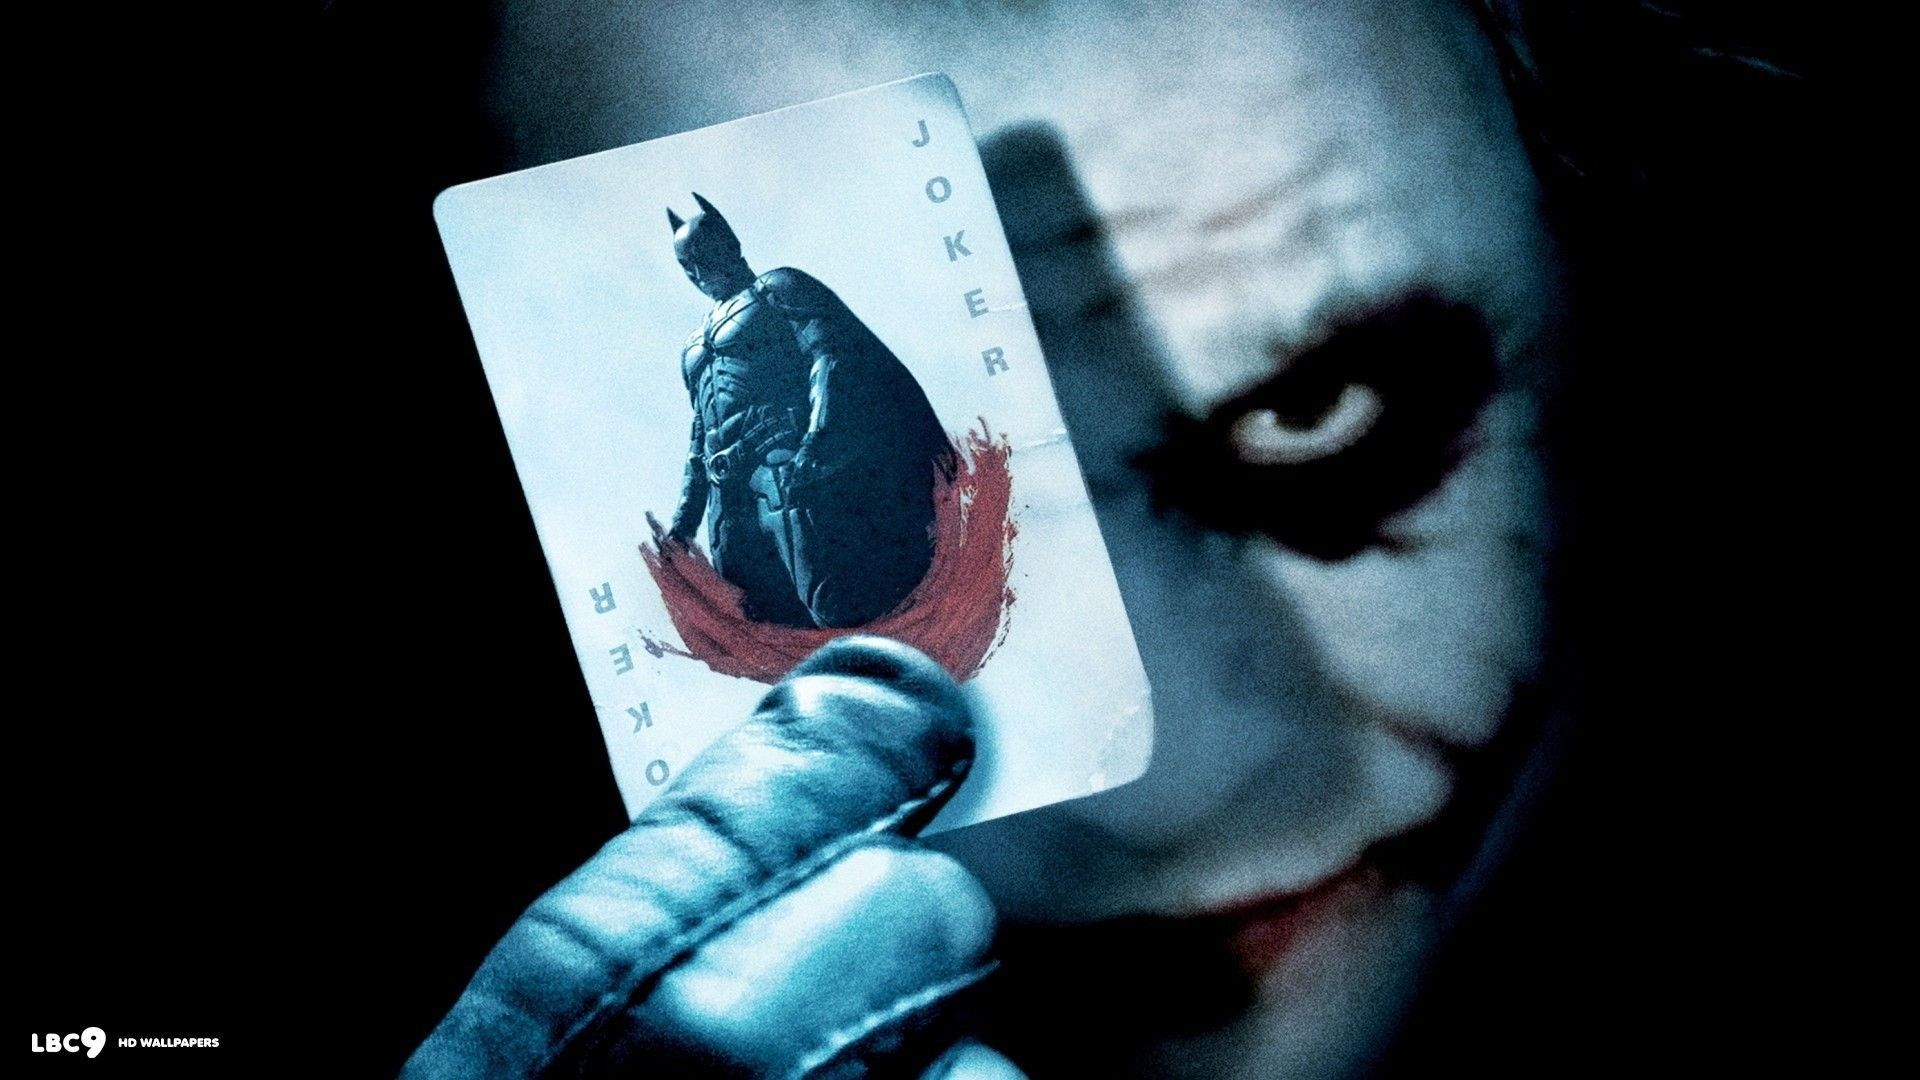 1920x1080 search results for batman villain joker wallpaper